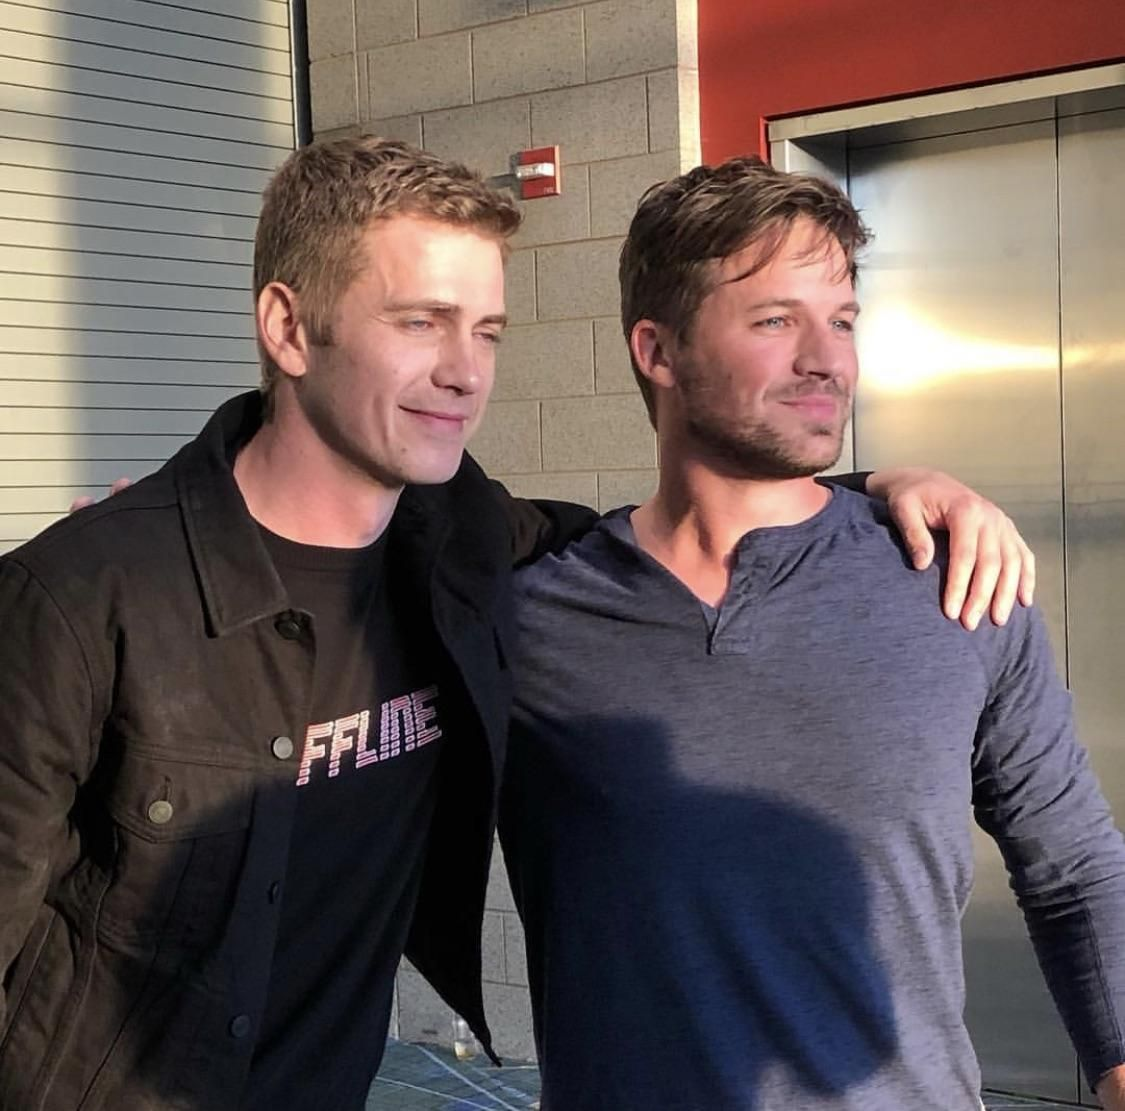 Hayden Christiansen and Matt Lanter together at